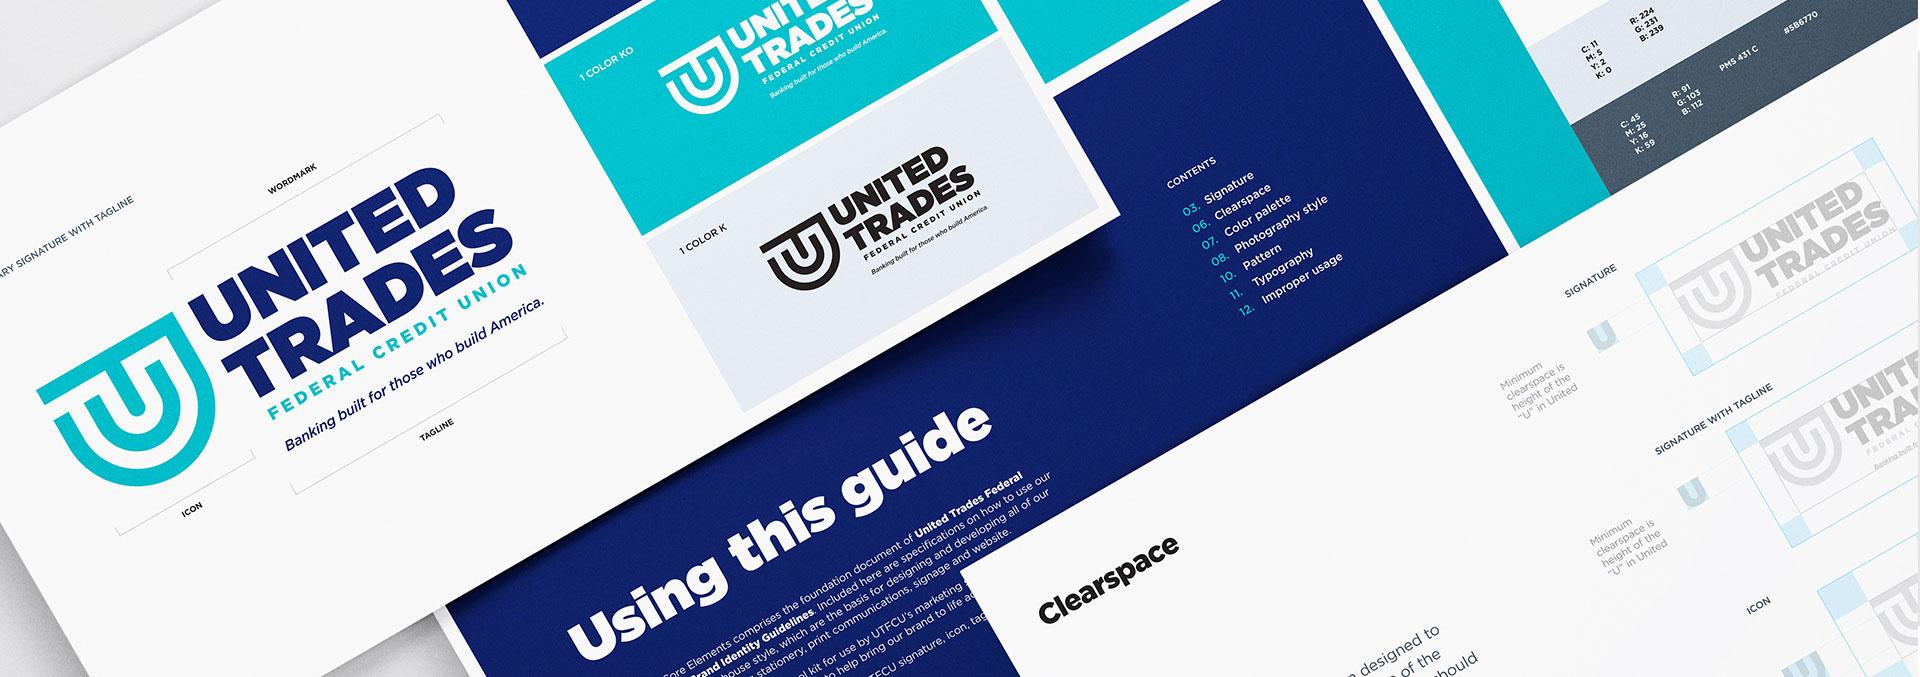 United Trades Federal Credit Union Rebranding by Austin Williams a New York Digital Marketing Agency